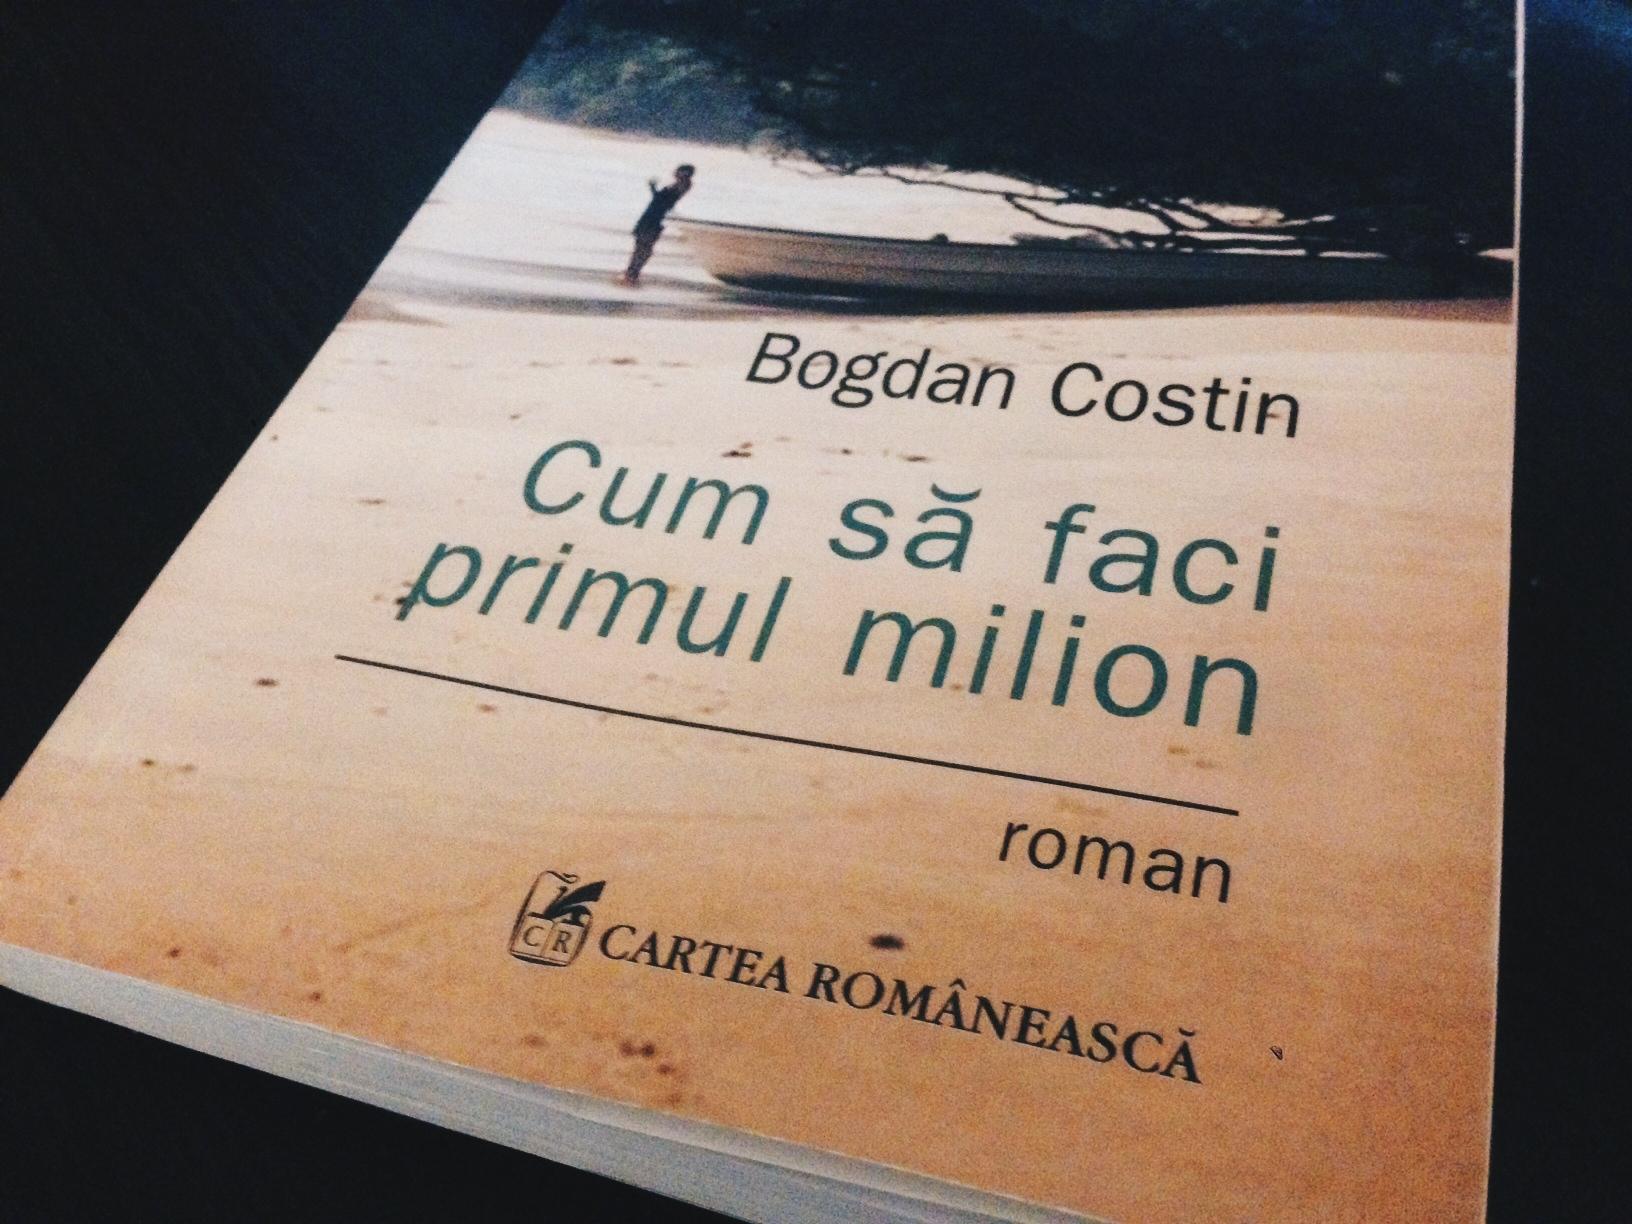 Bogdan Costin - Cum sa faci primul milion